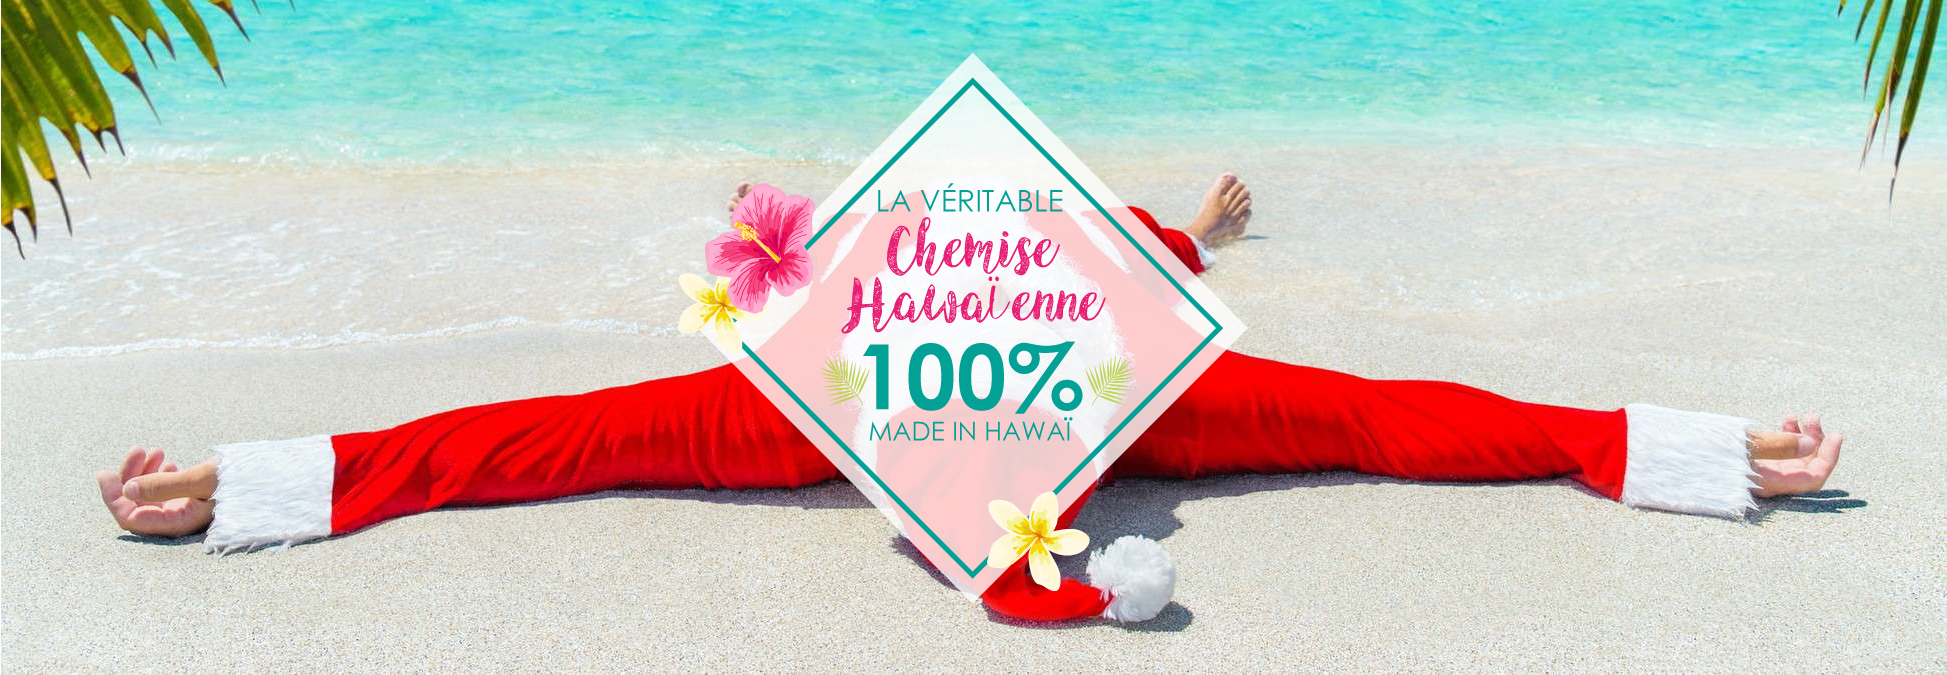 carrousel-la-chemise-hawaienne-1